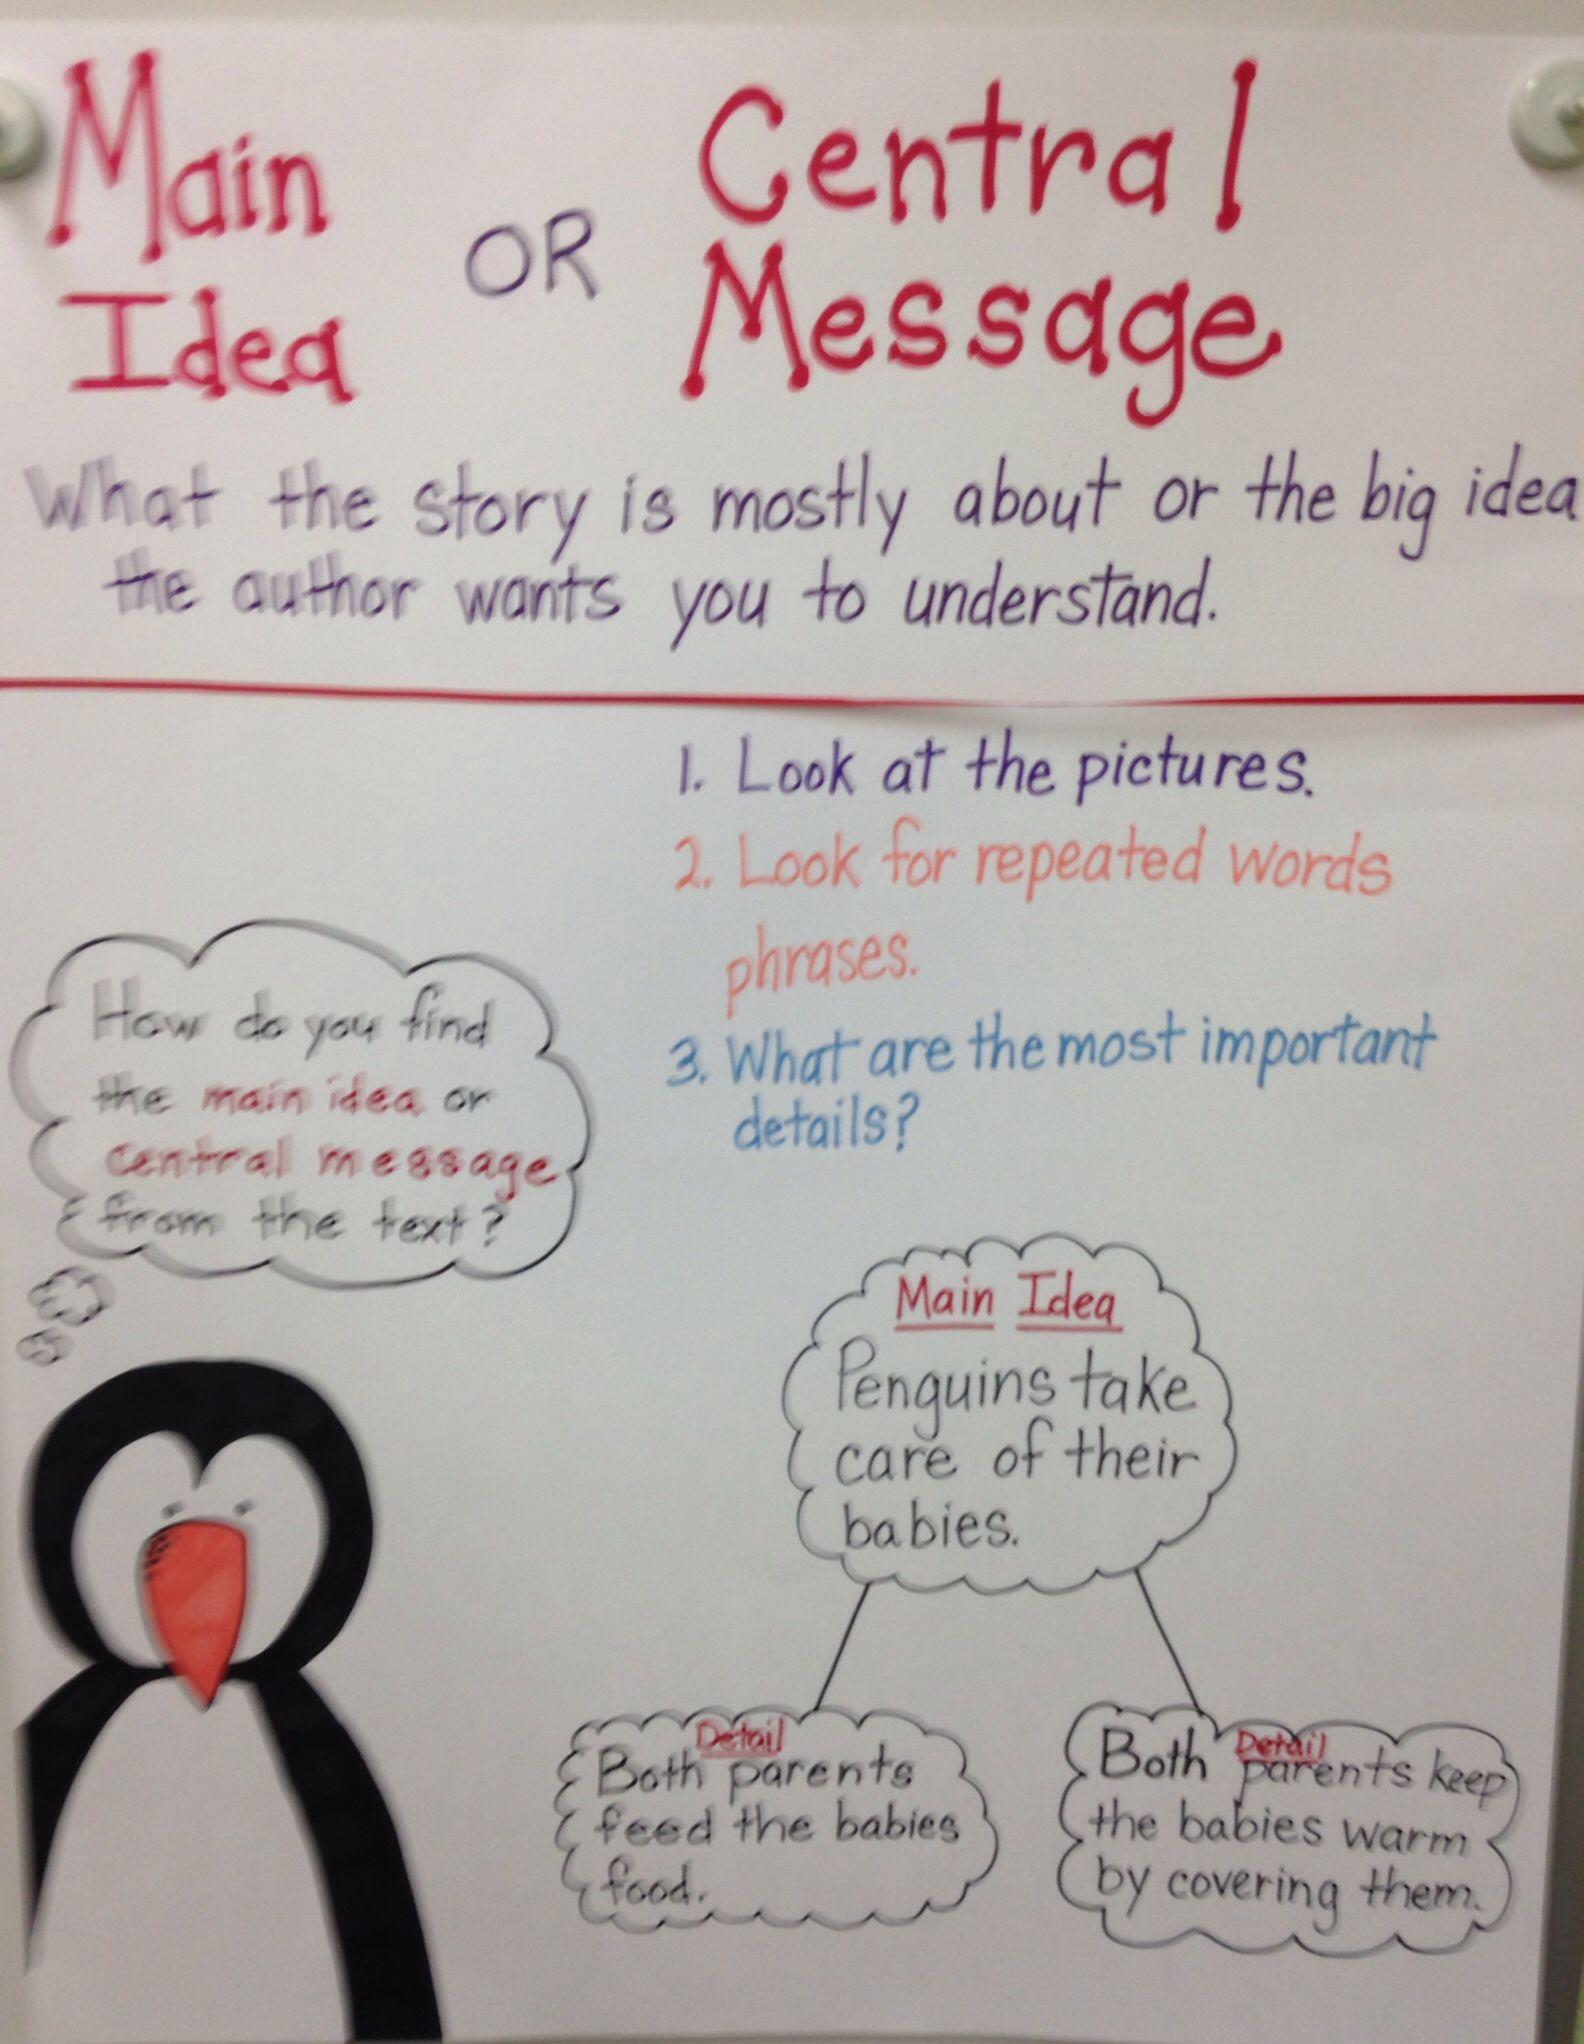 Main Idea Vs Central Message Third Grade Common Core Reading Central Message Reading Skills Anchor Charts Main Idea Worksheet